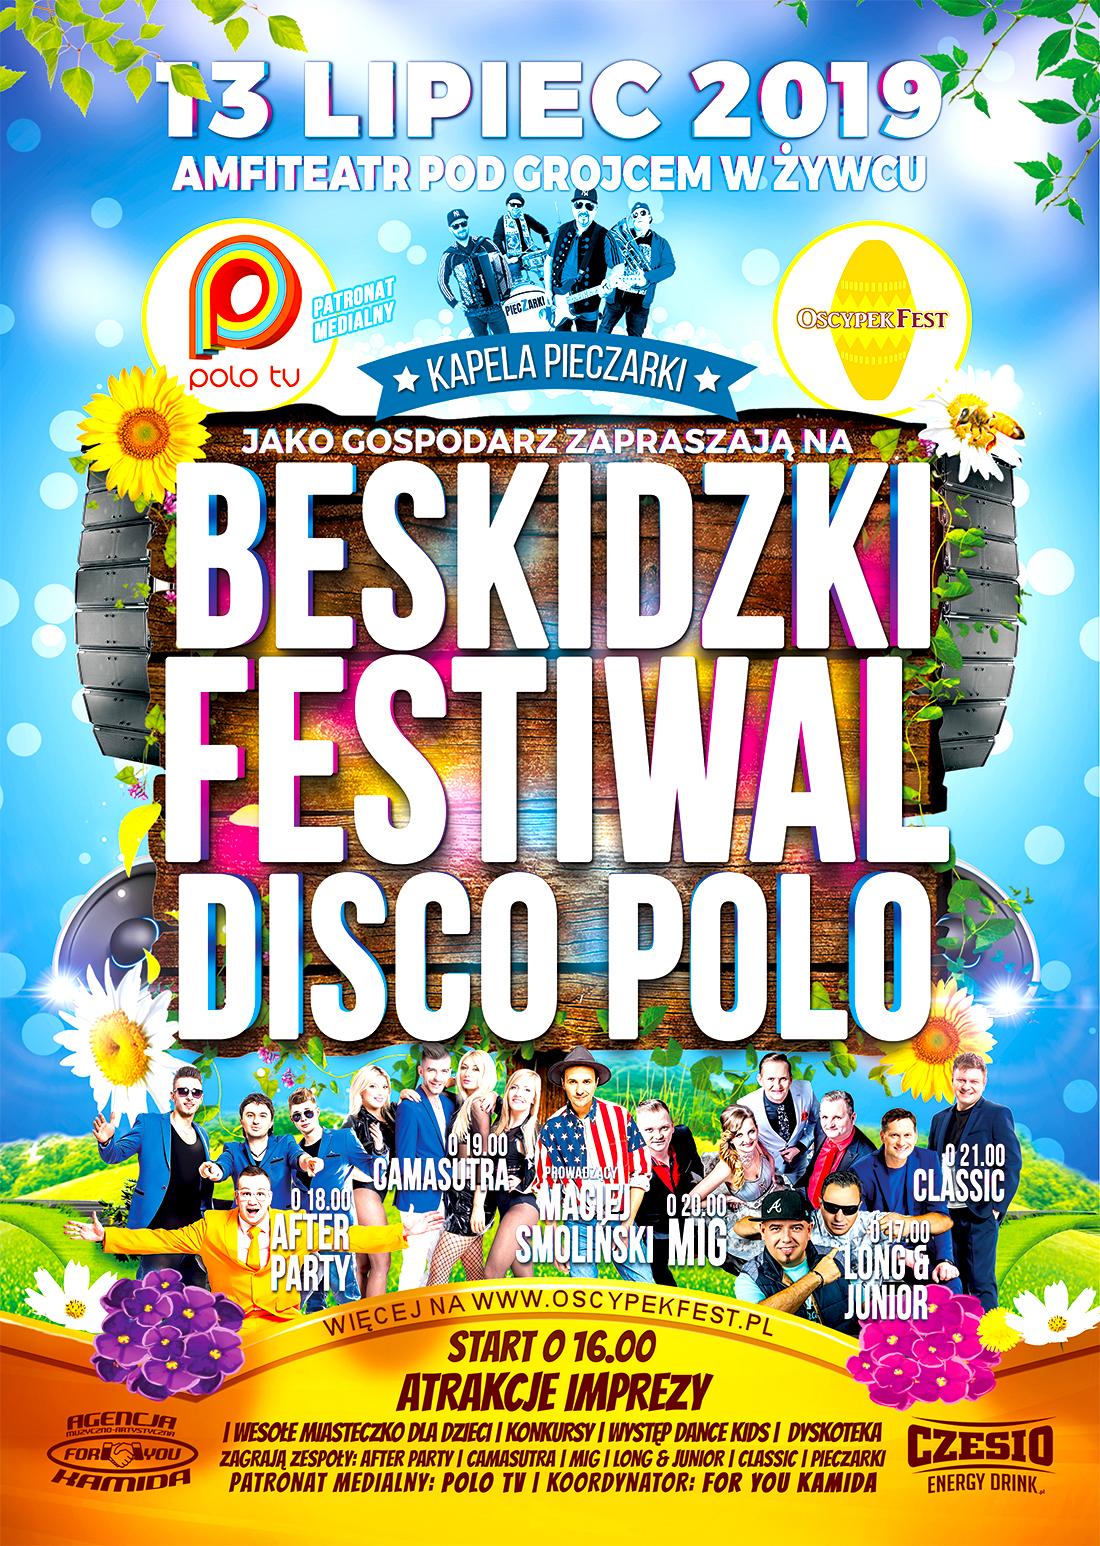 Beskidzki Festiwal Disco Polo